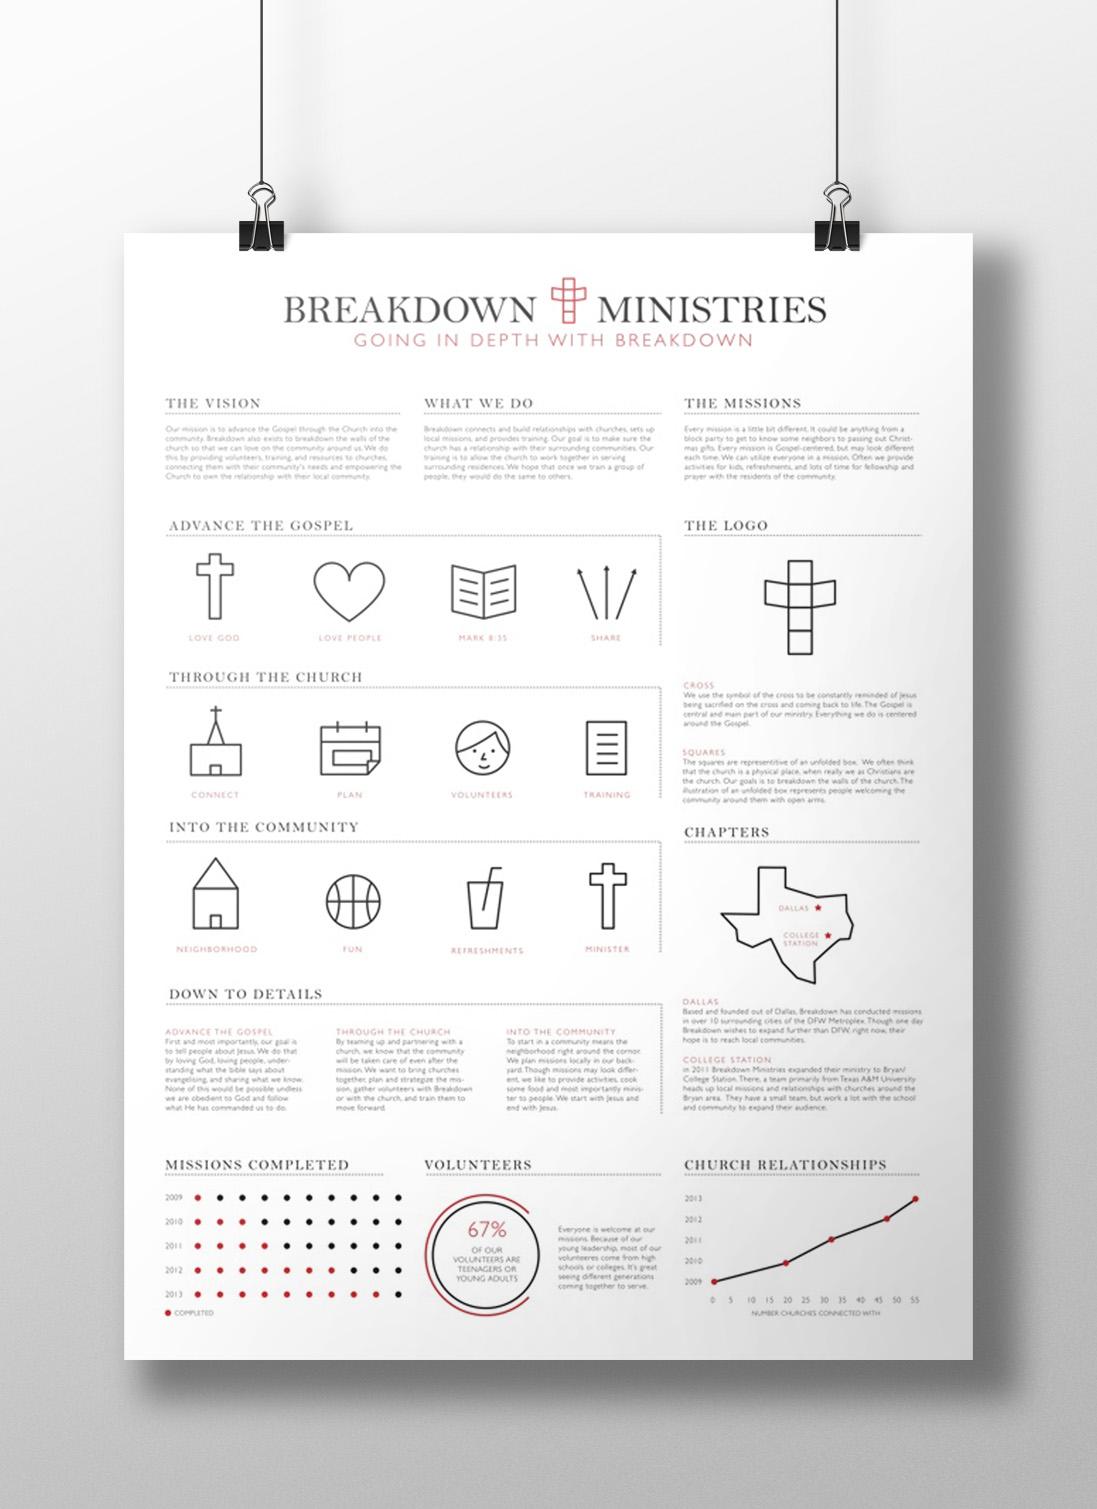 Breakdown Ministries Infographic